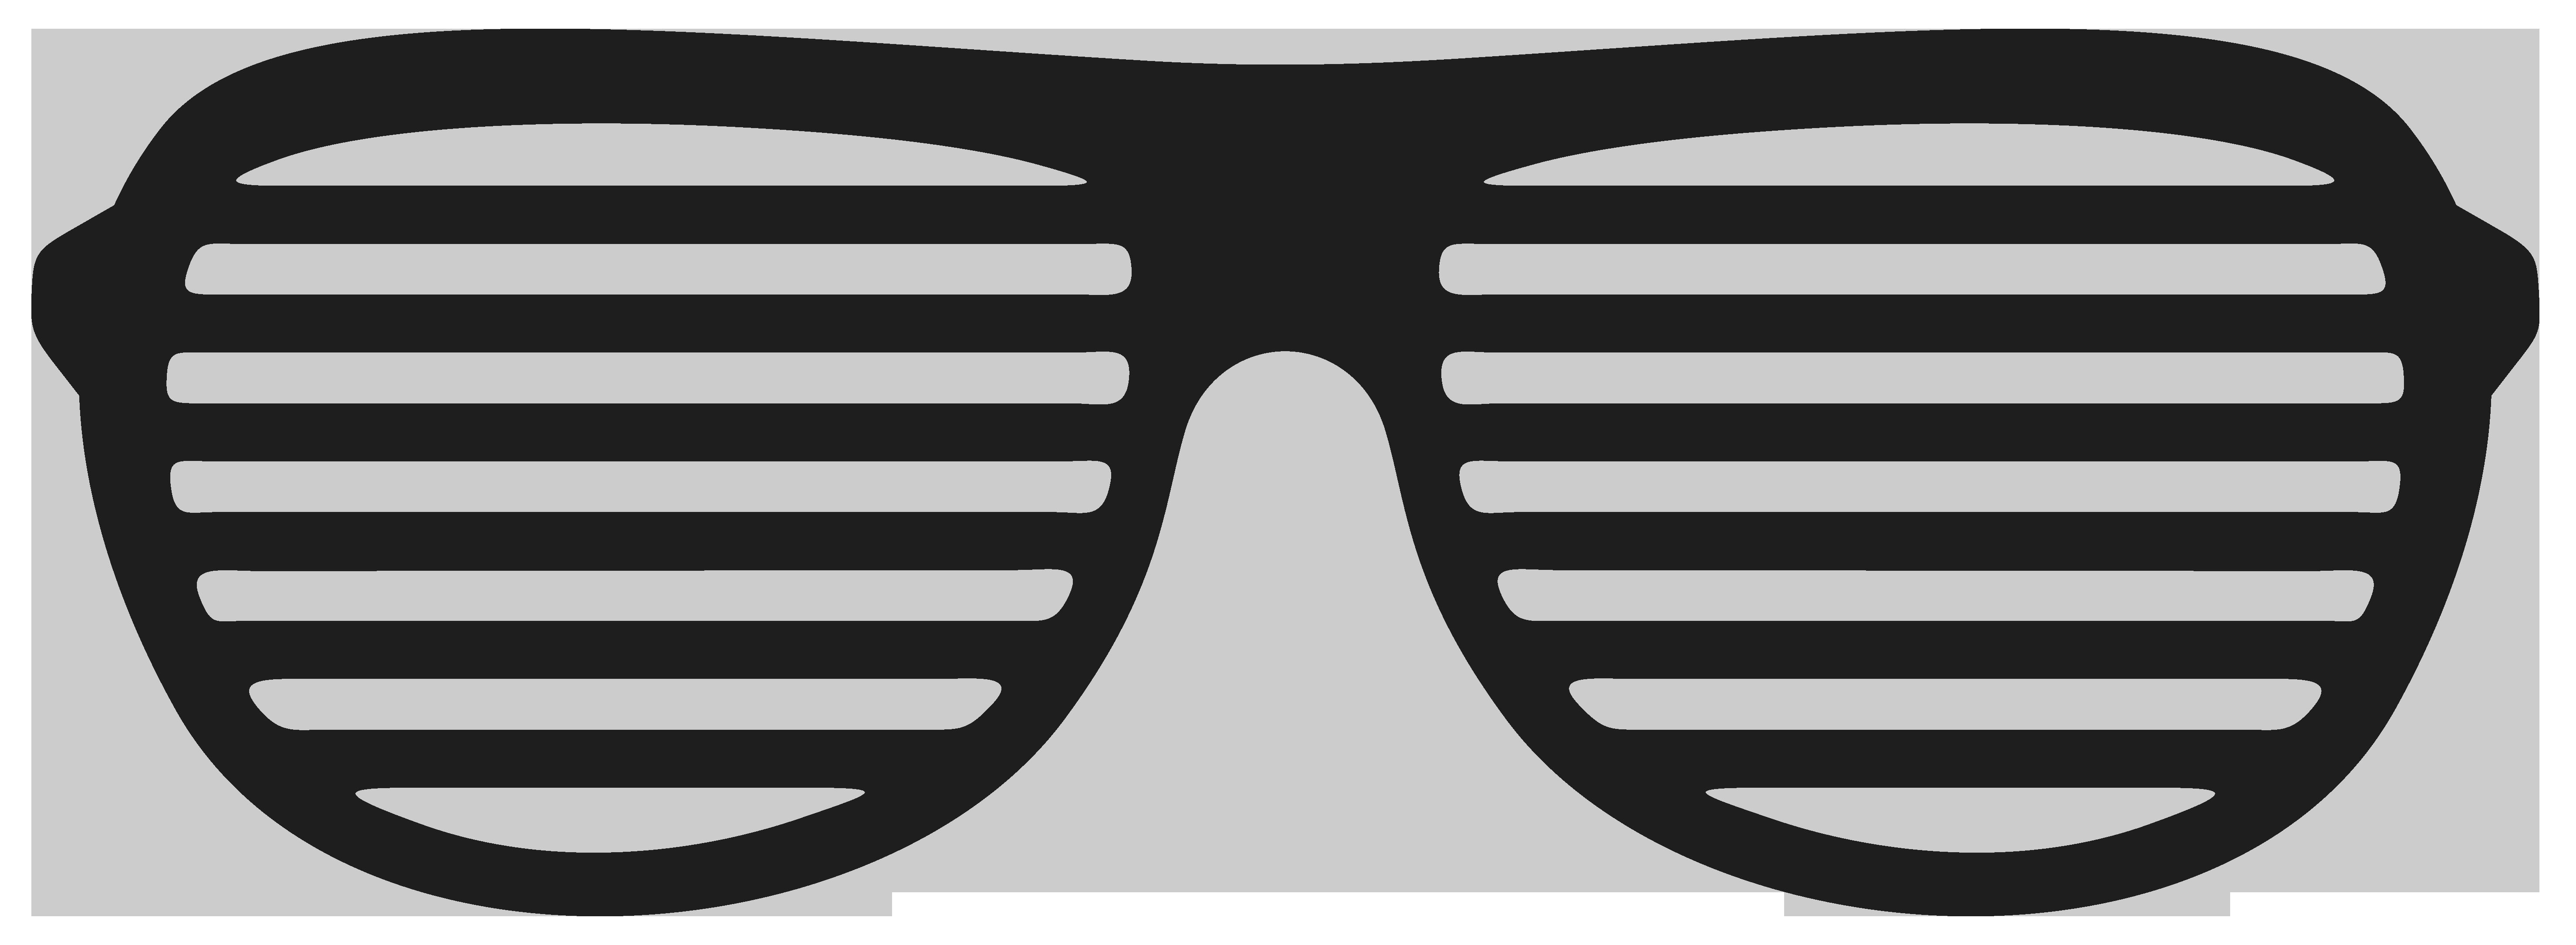 Shutter shades Aviator sunglasses Clip art.